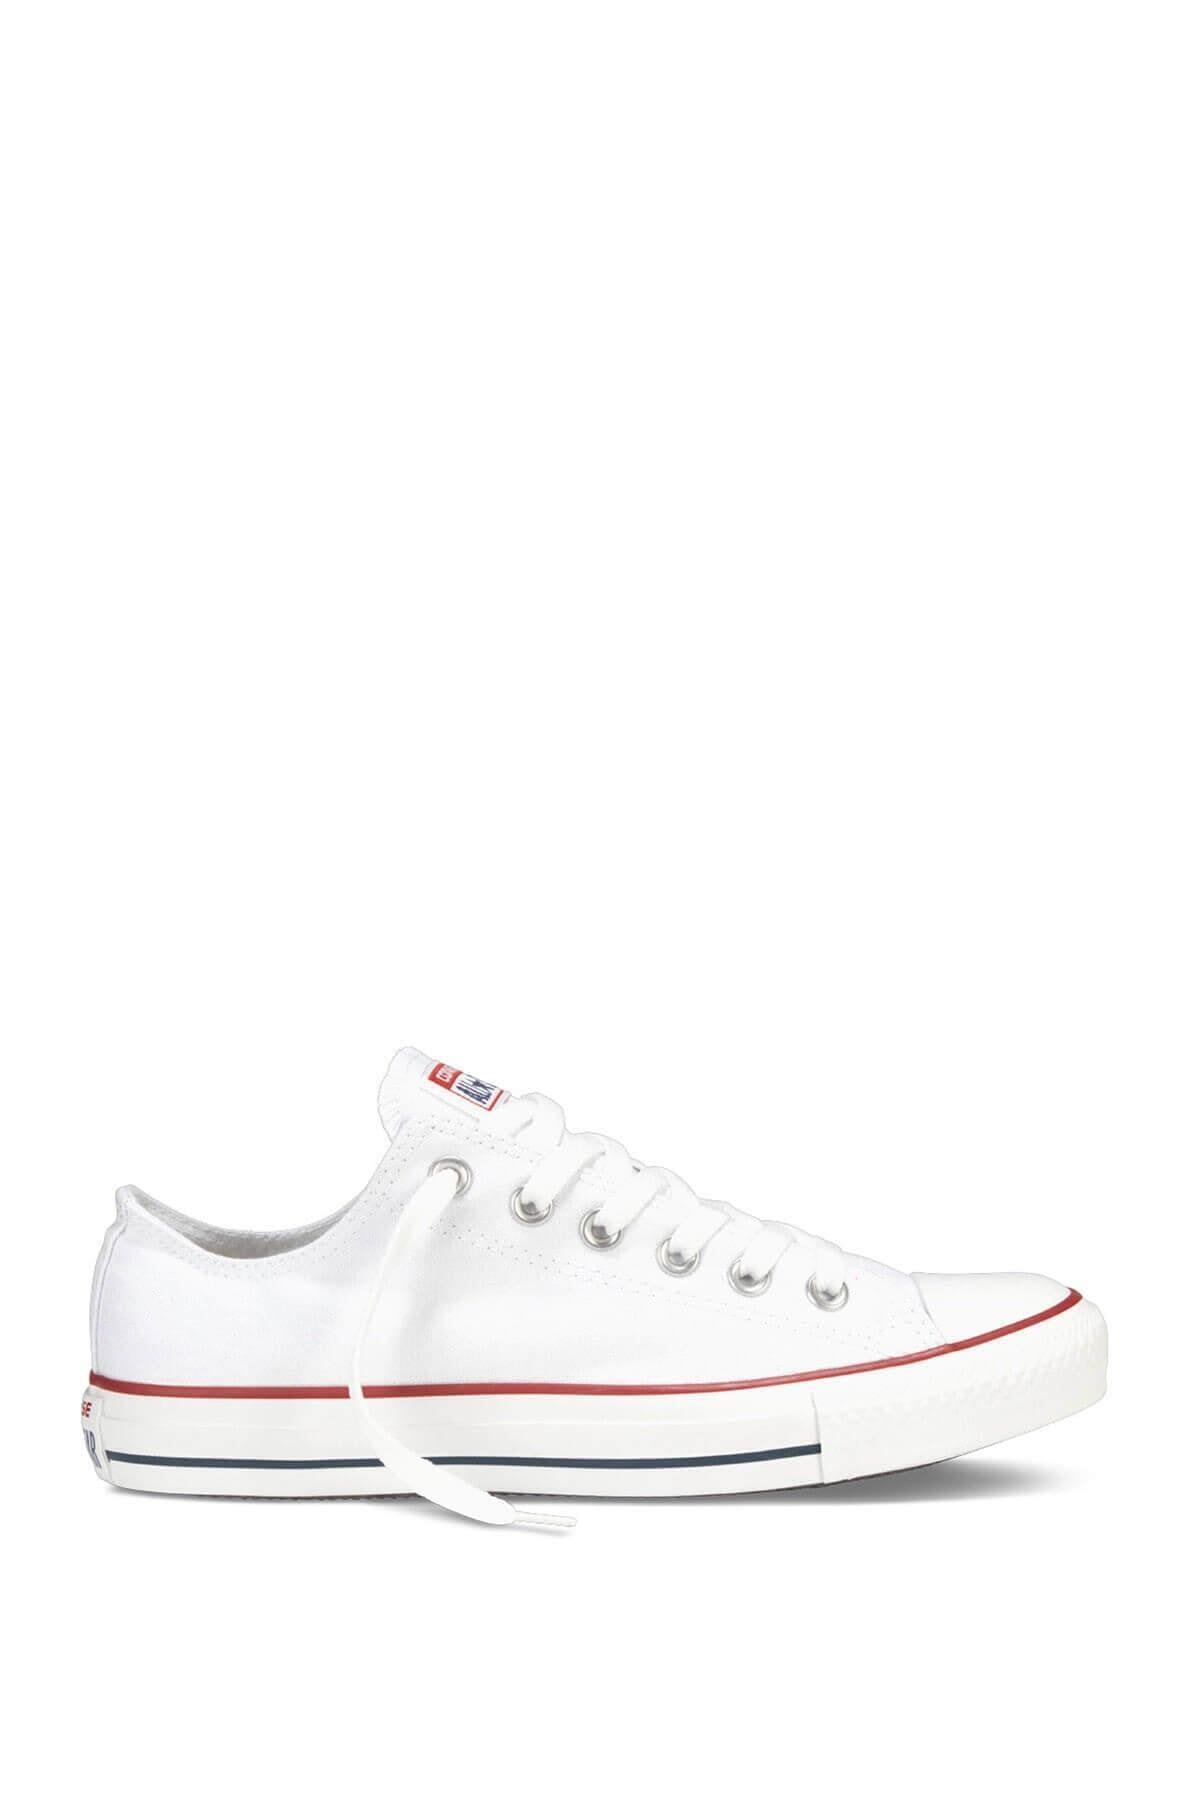 converse Unisex Sneaker M7652 Chuck Taylor Allstar - M7652c 1